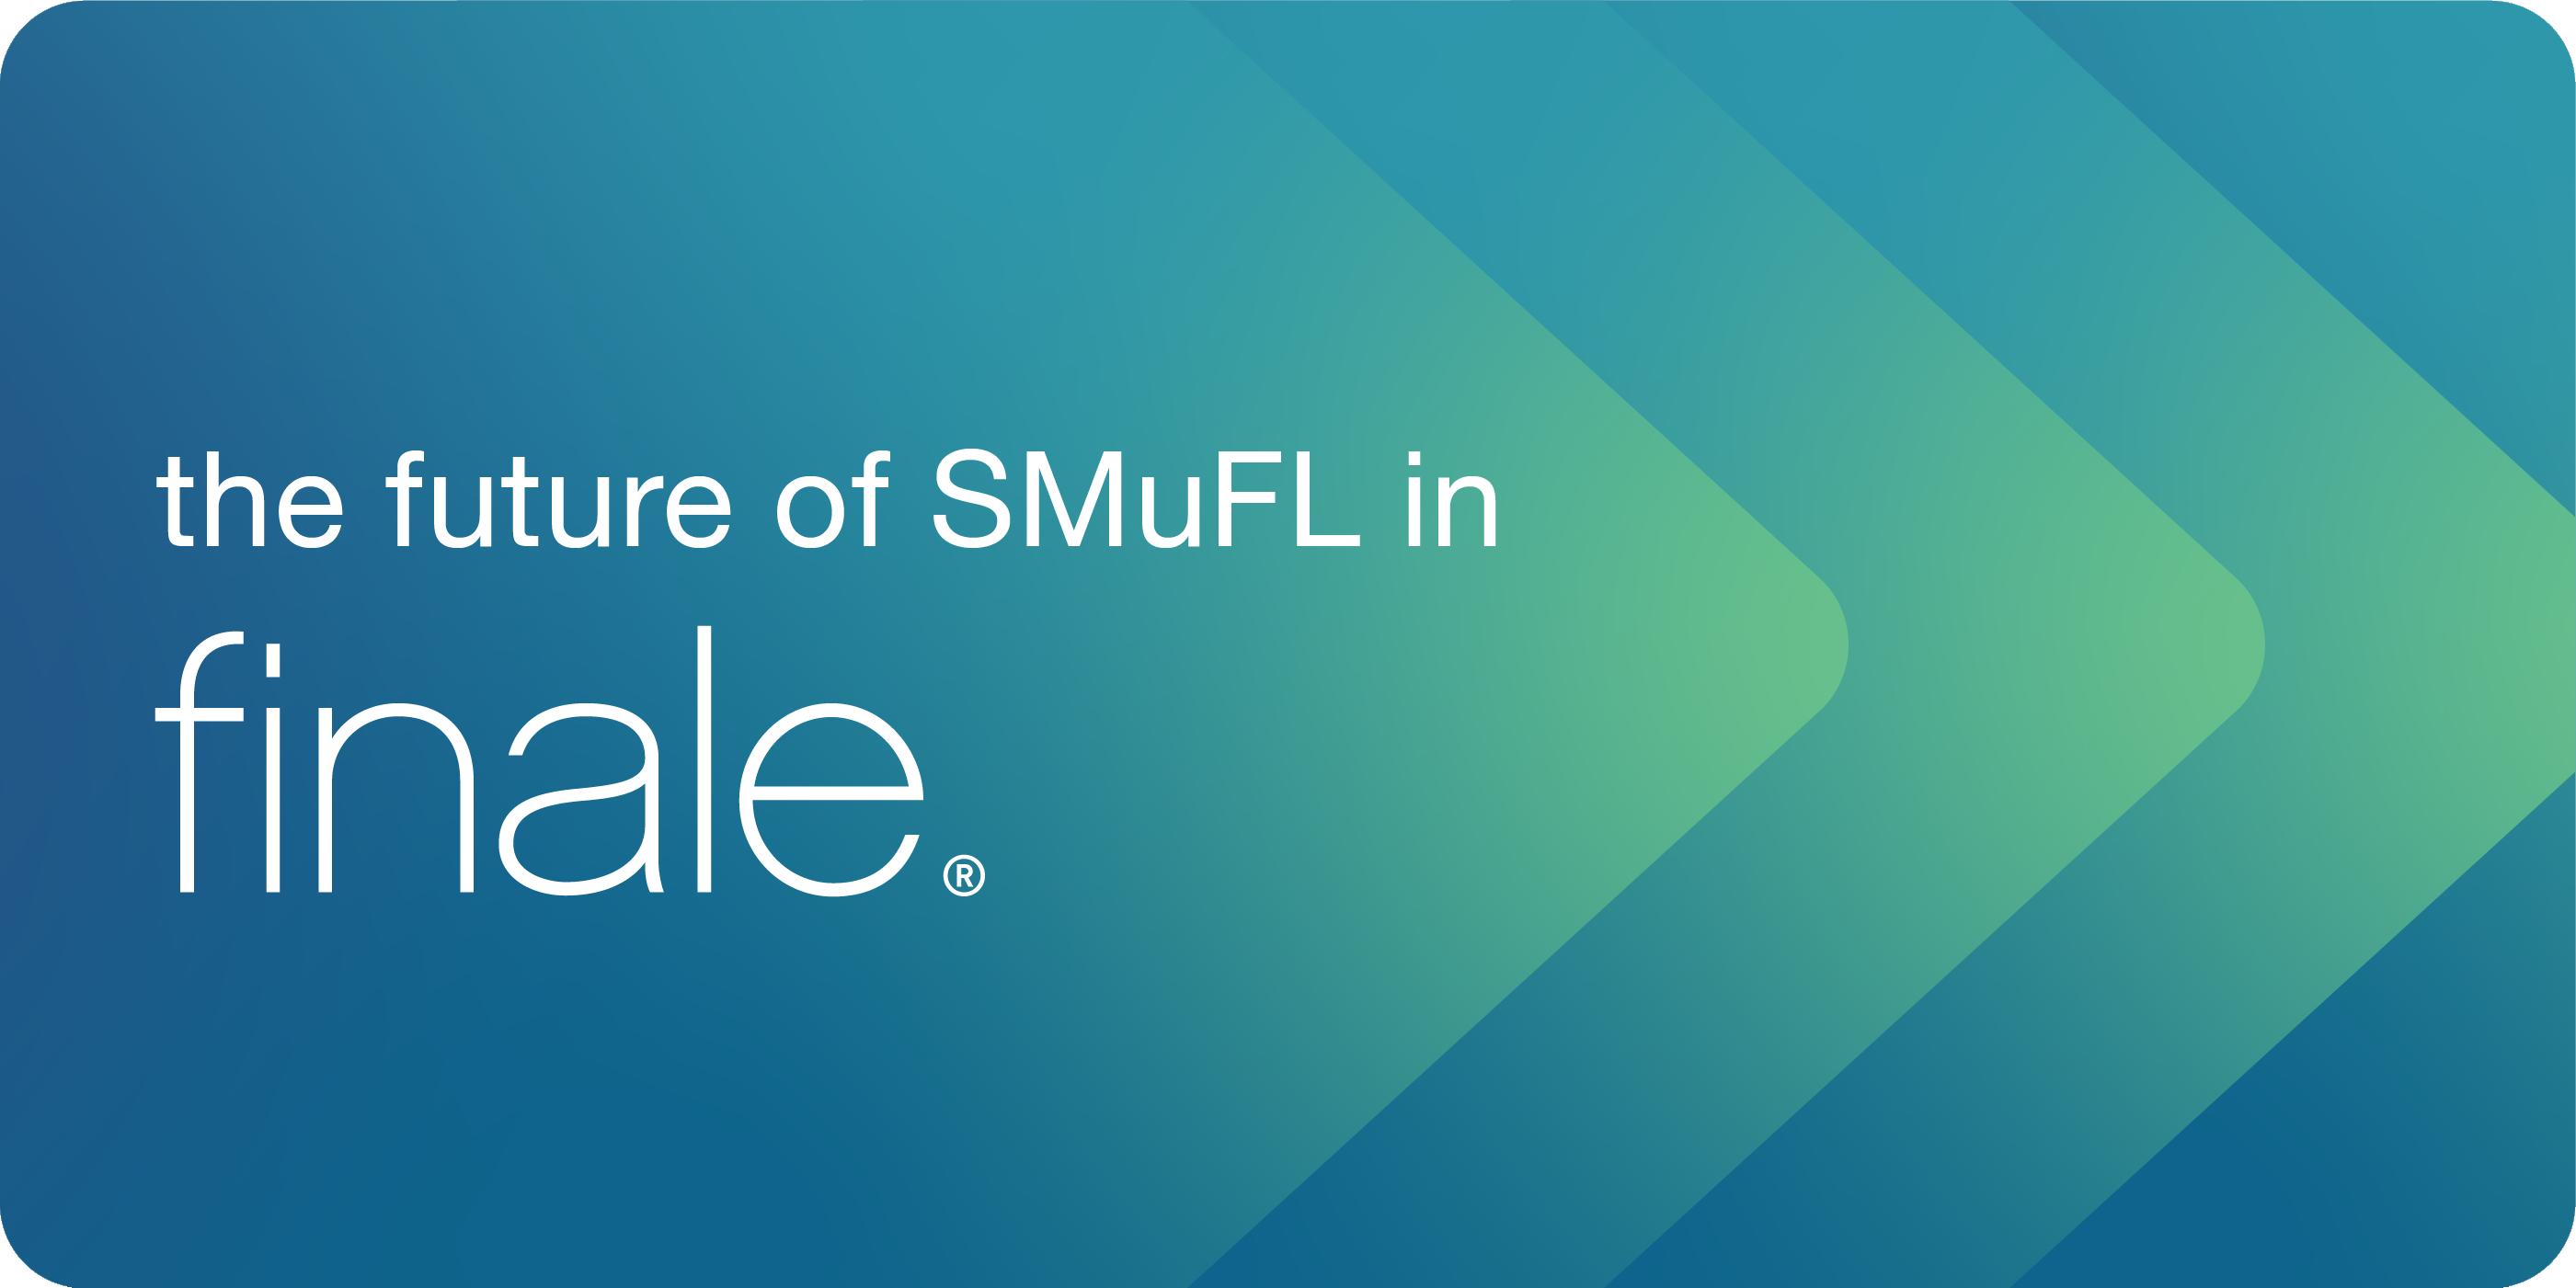 future of smufl